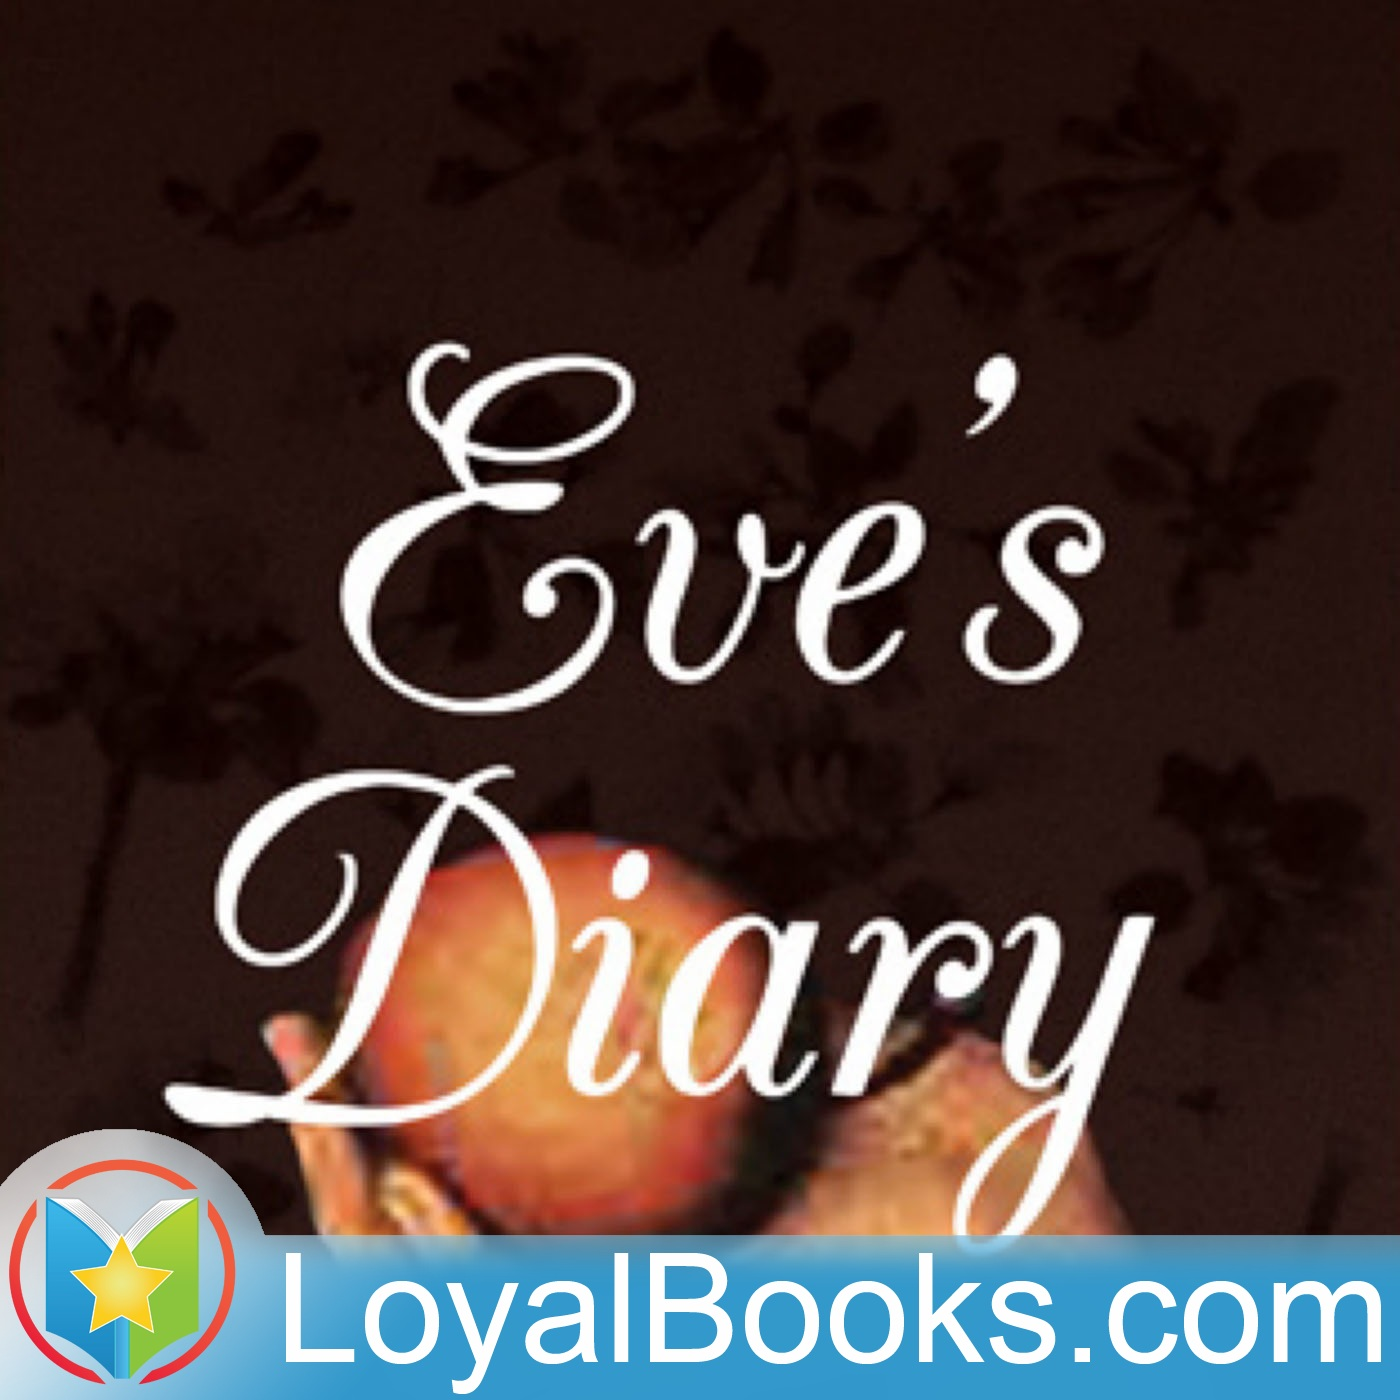 <![CDATA[Eve's Diary by Mark Twain]]>